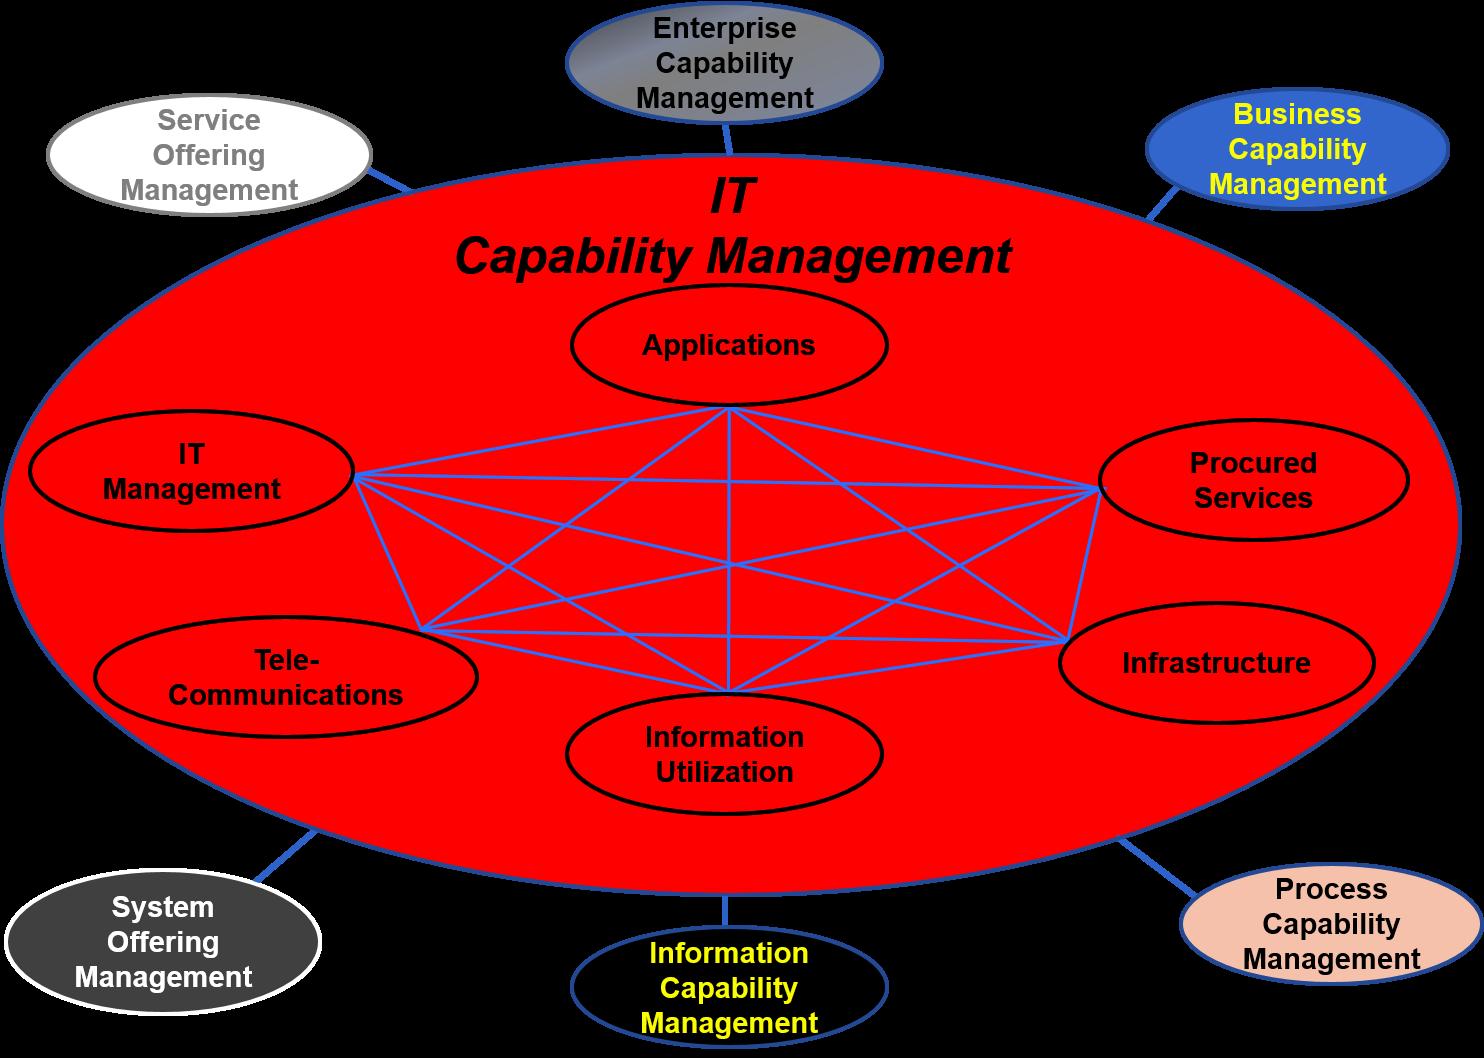 IT Capability Management